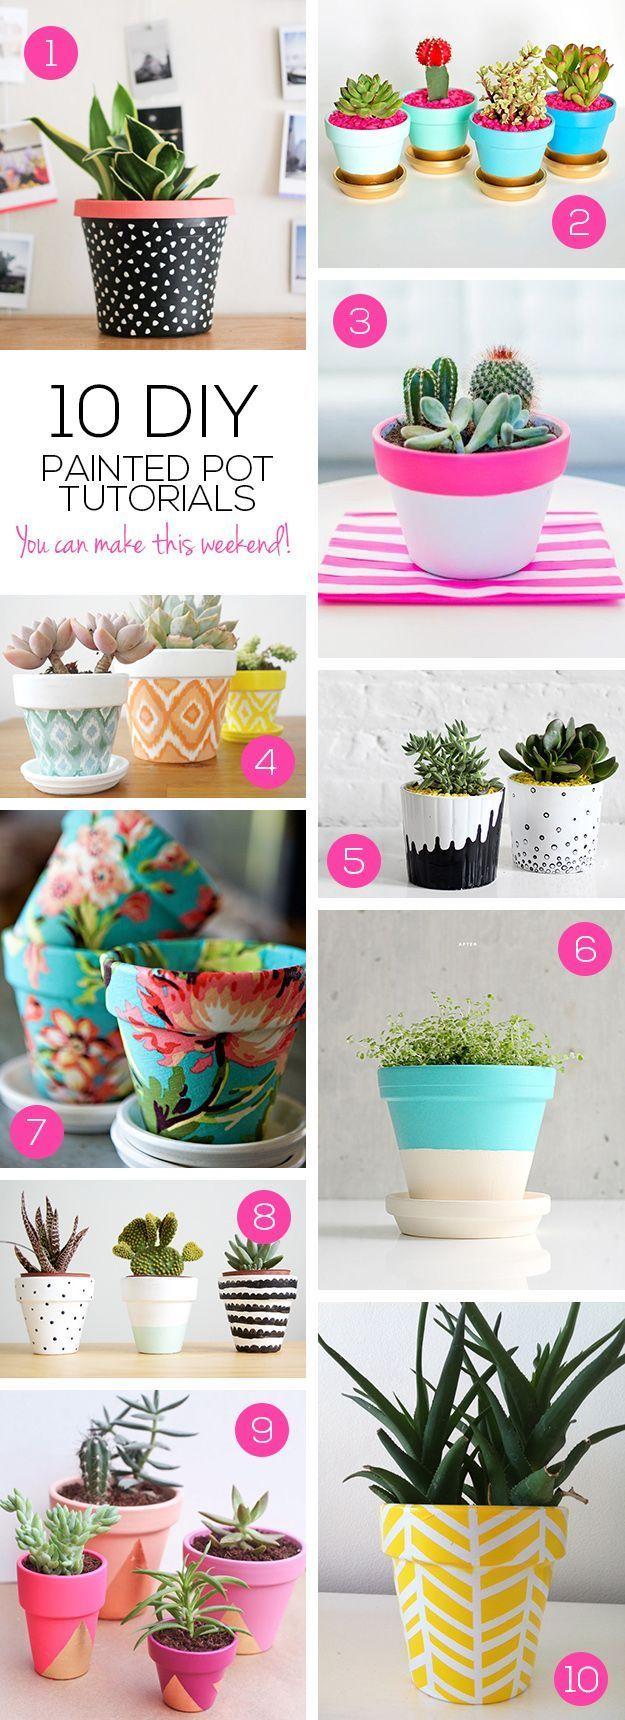 best cozy home images on pinterest creative ideas good ideas